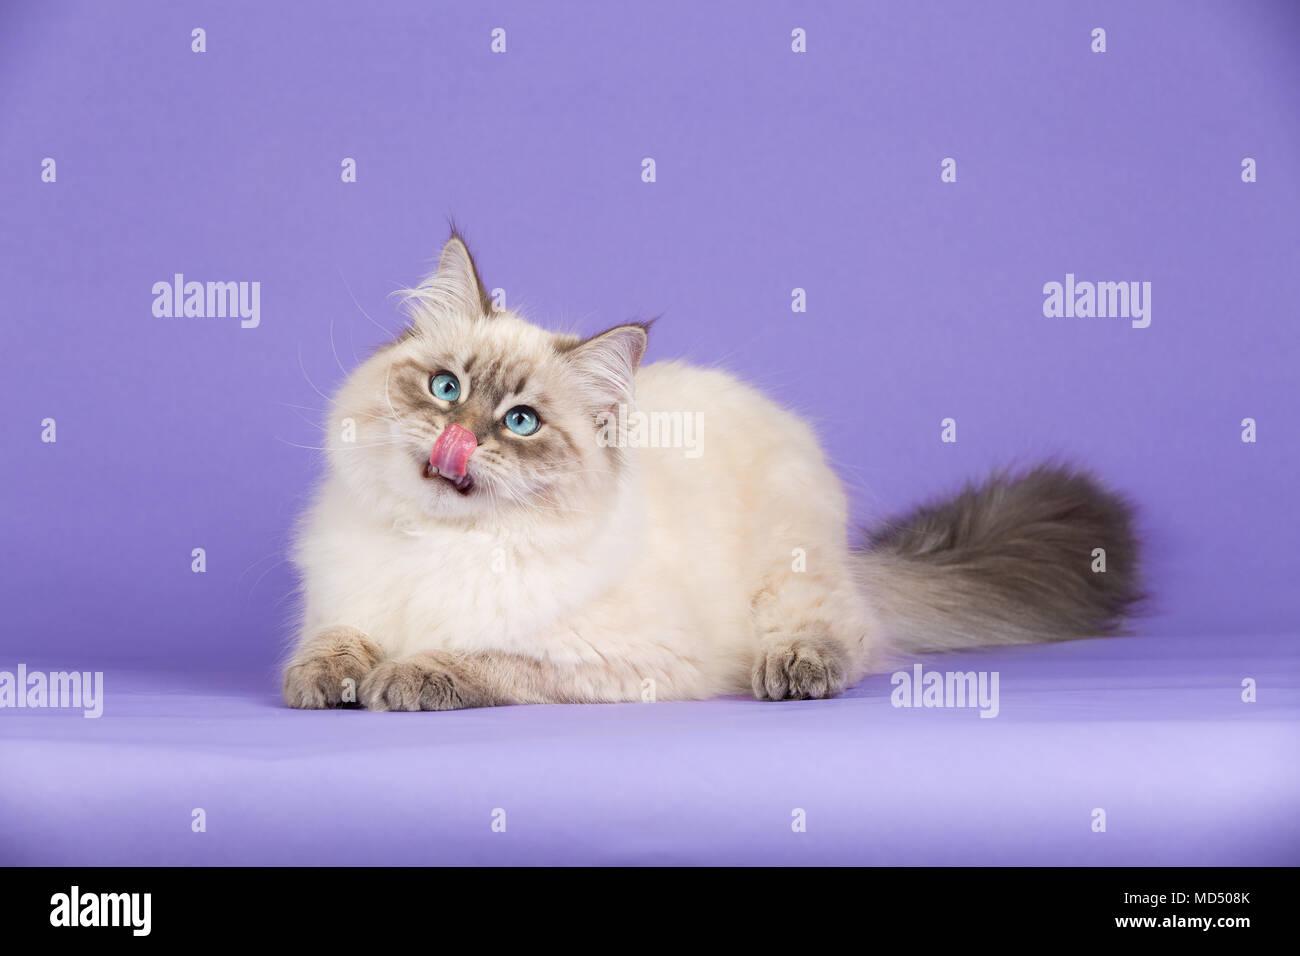 Amazing Siberian cat on purple - Stock Image